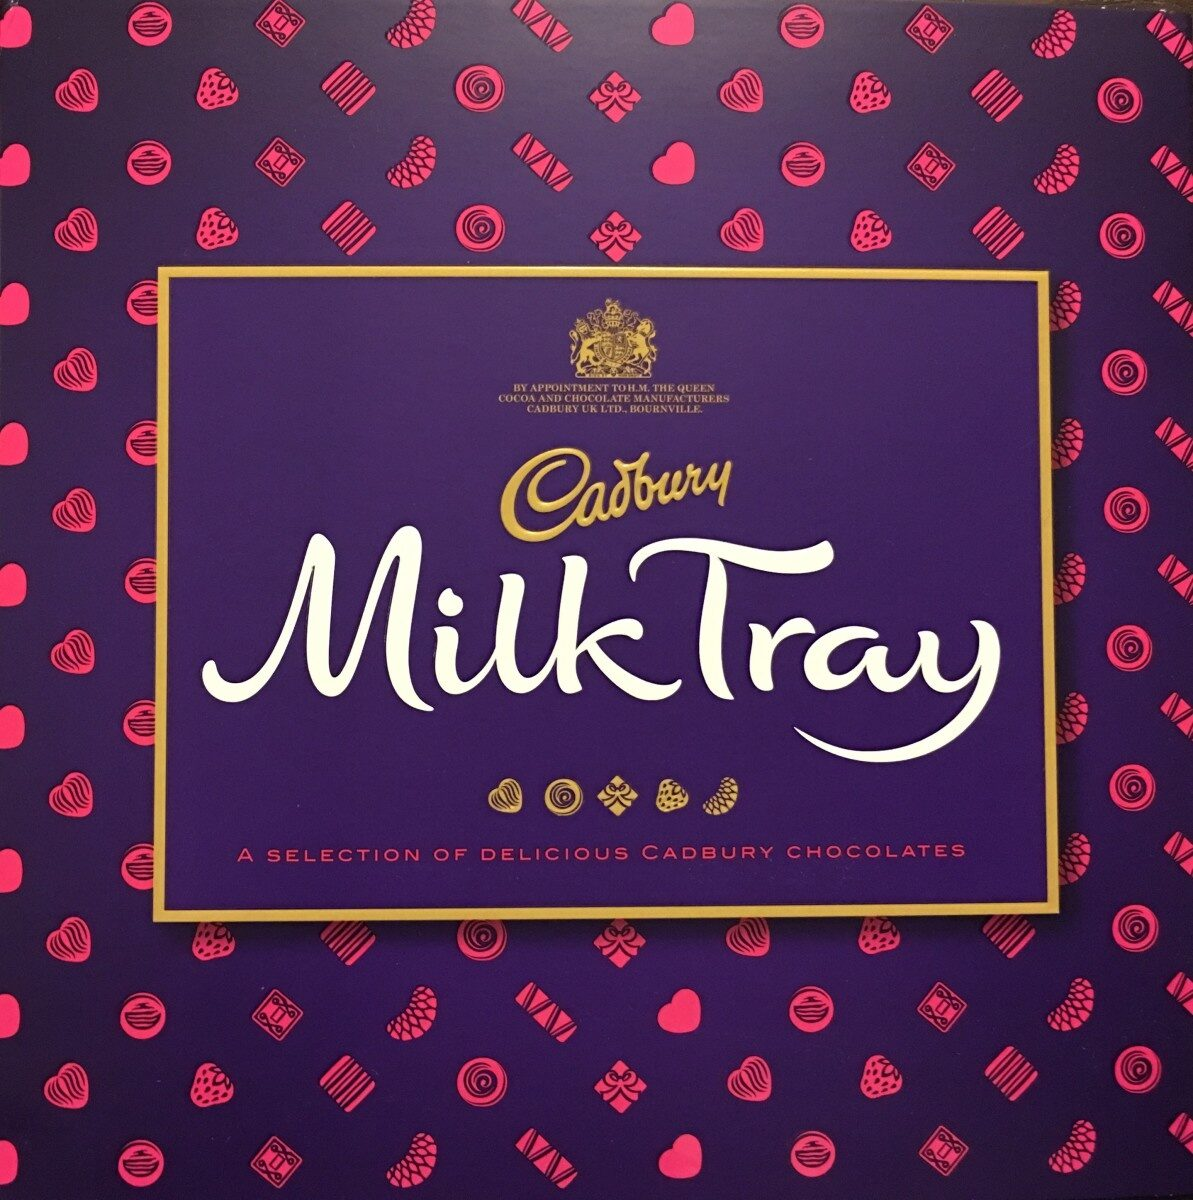 Cadbury chocolate and milk - Producte - en